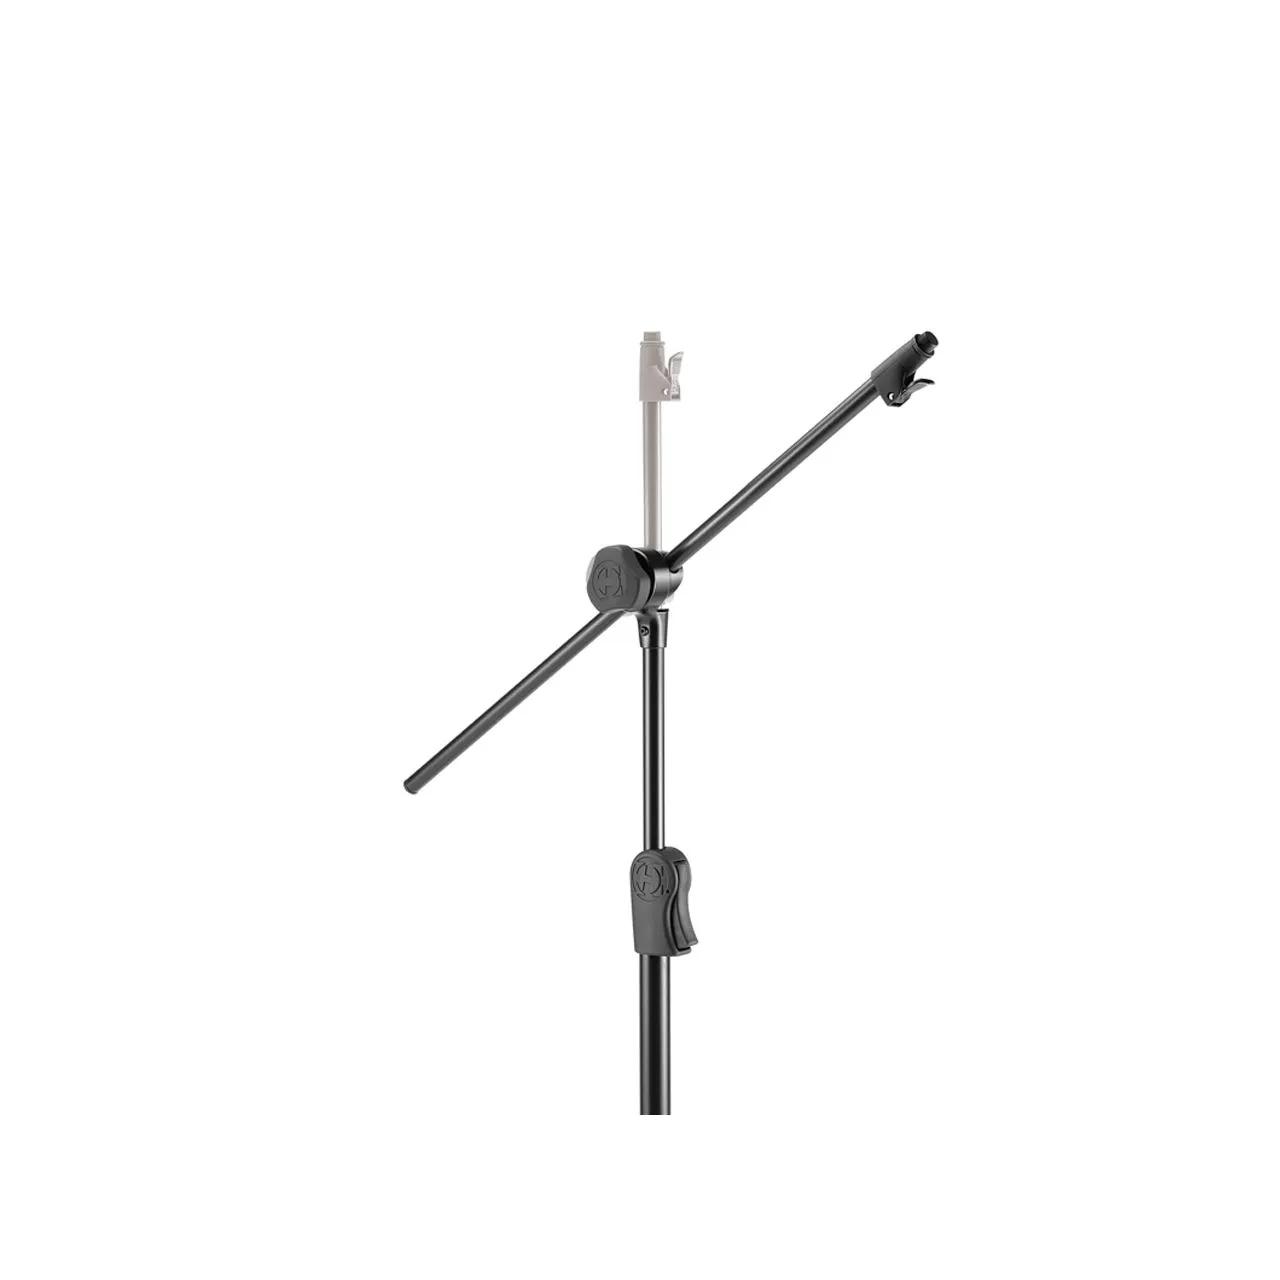 Suporte Pedestal Tripe P/microfone C/conversor Reto P/girafa Ms533b Hercules